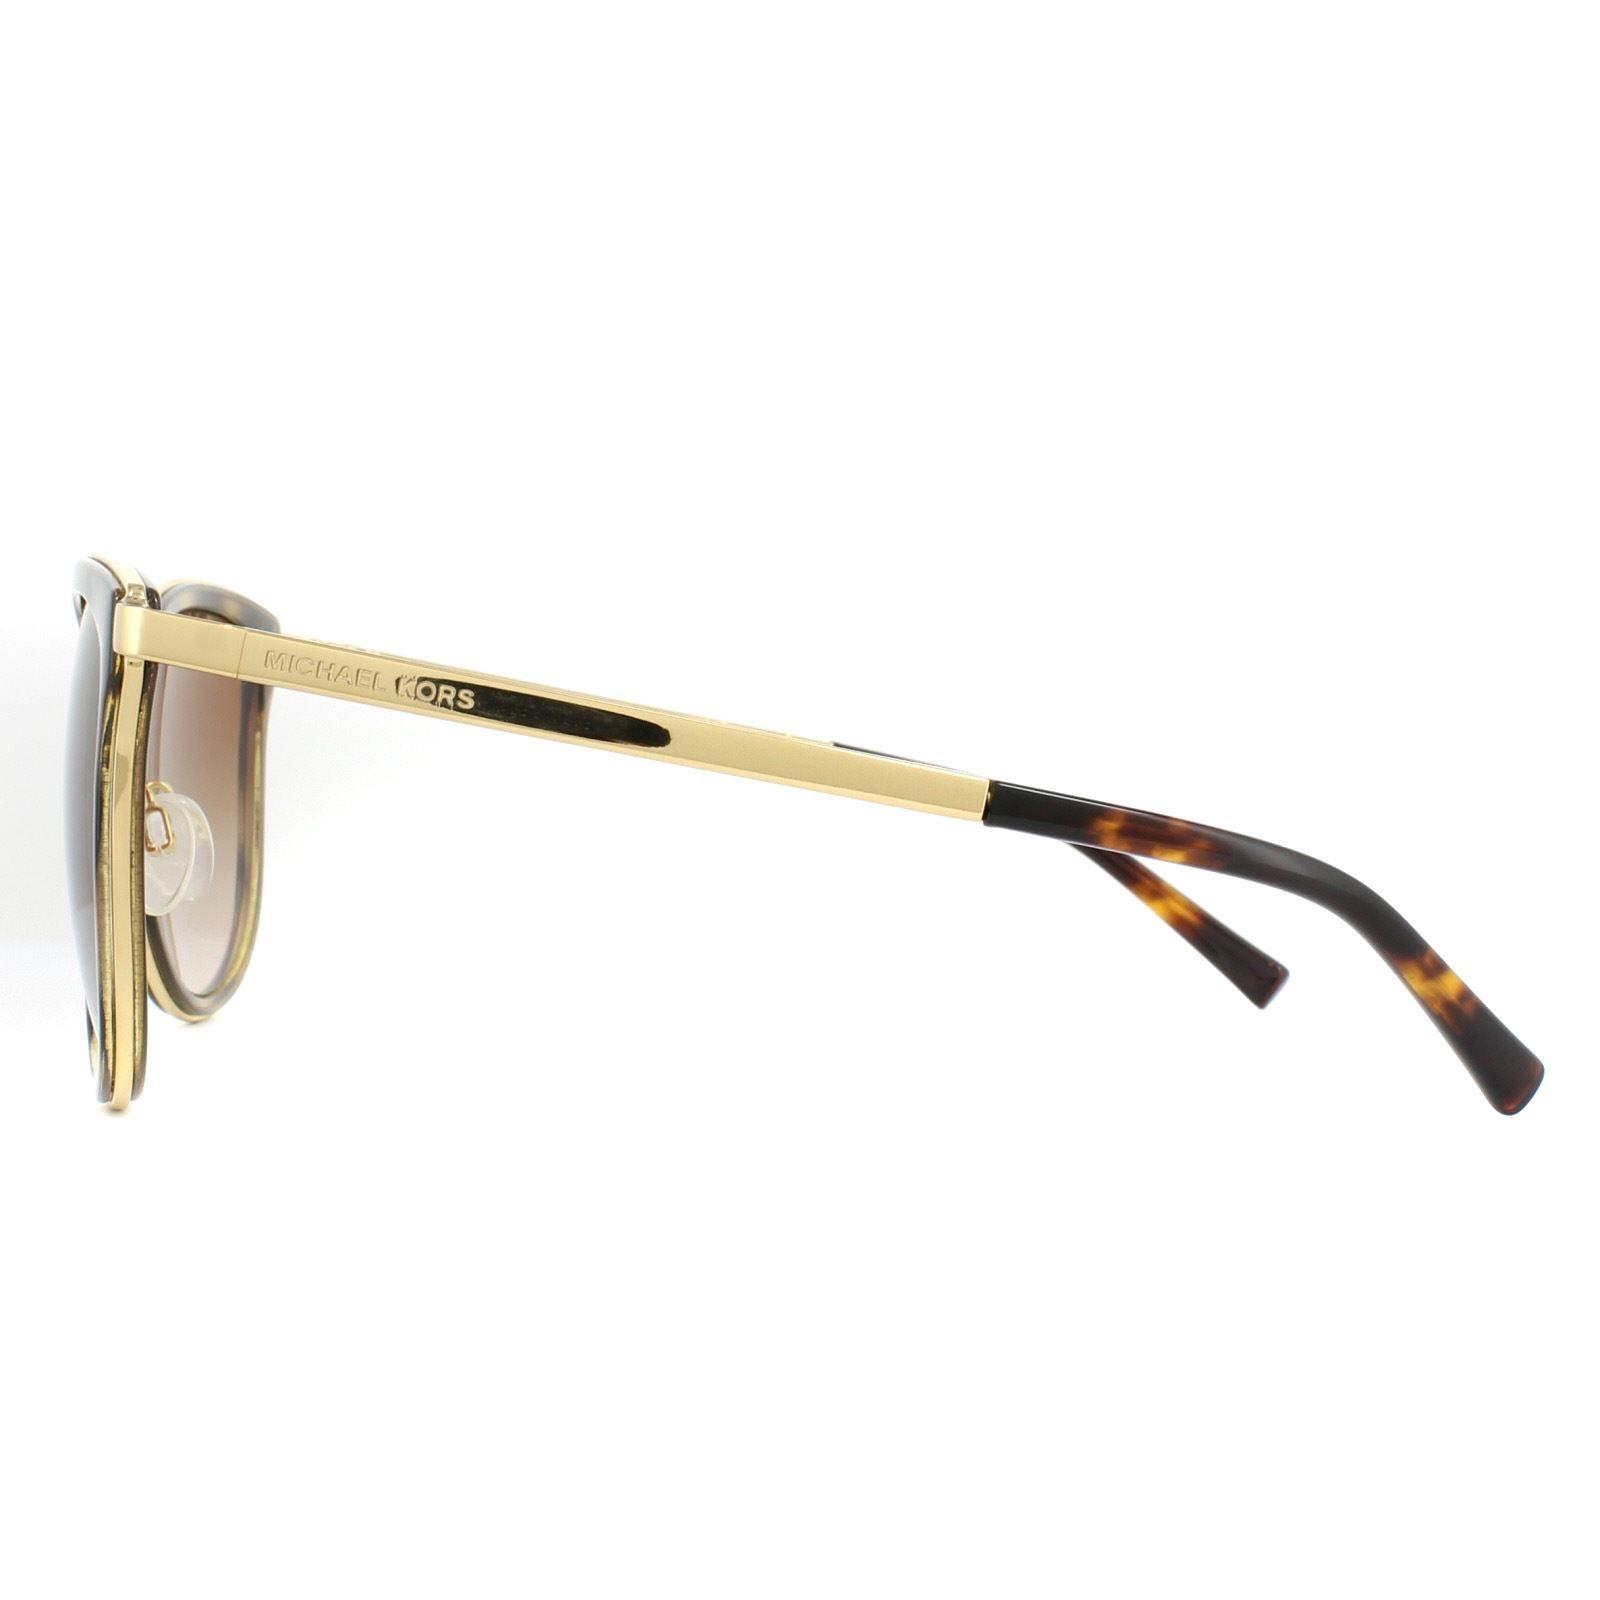 Michael Kors Sunglasses Adrianna 1 1010 110113 Dark Tortoise Gold Brown Gradient